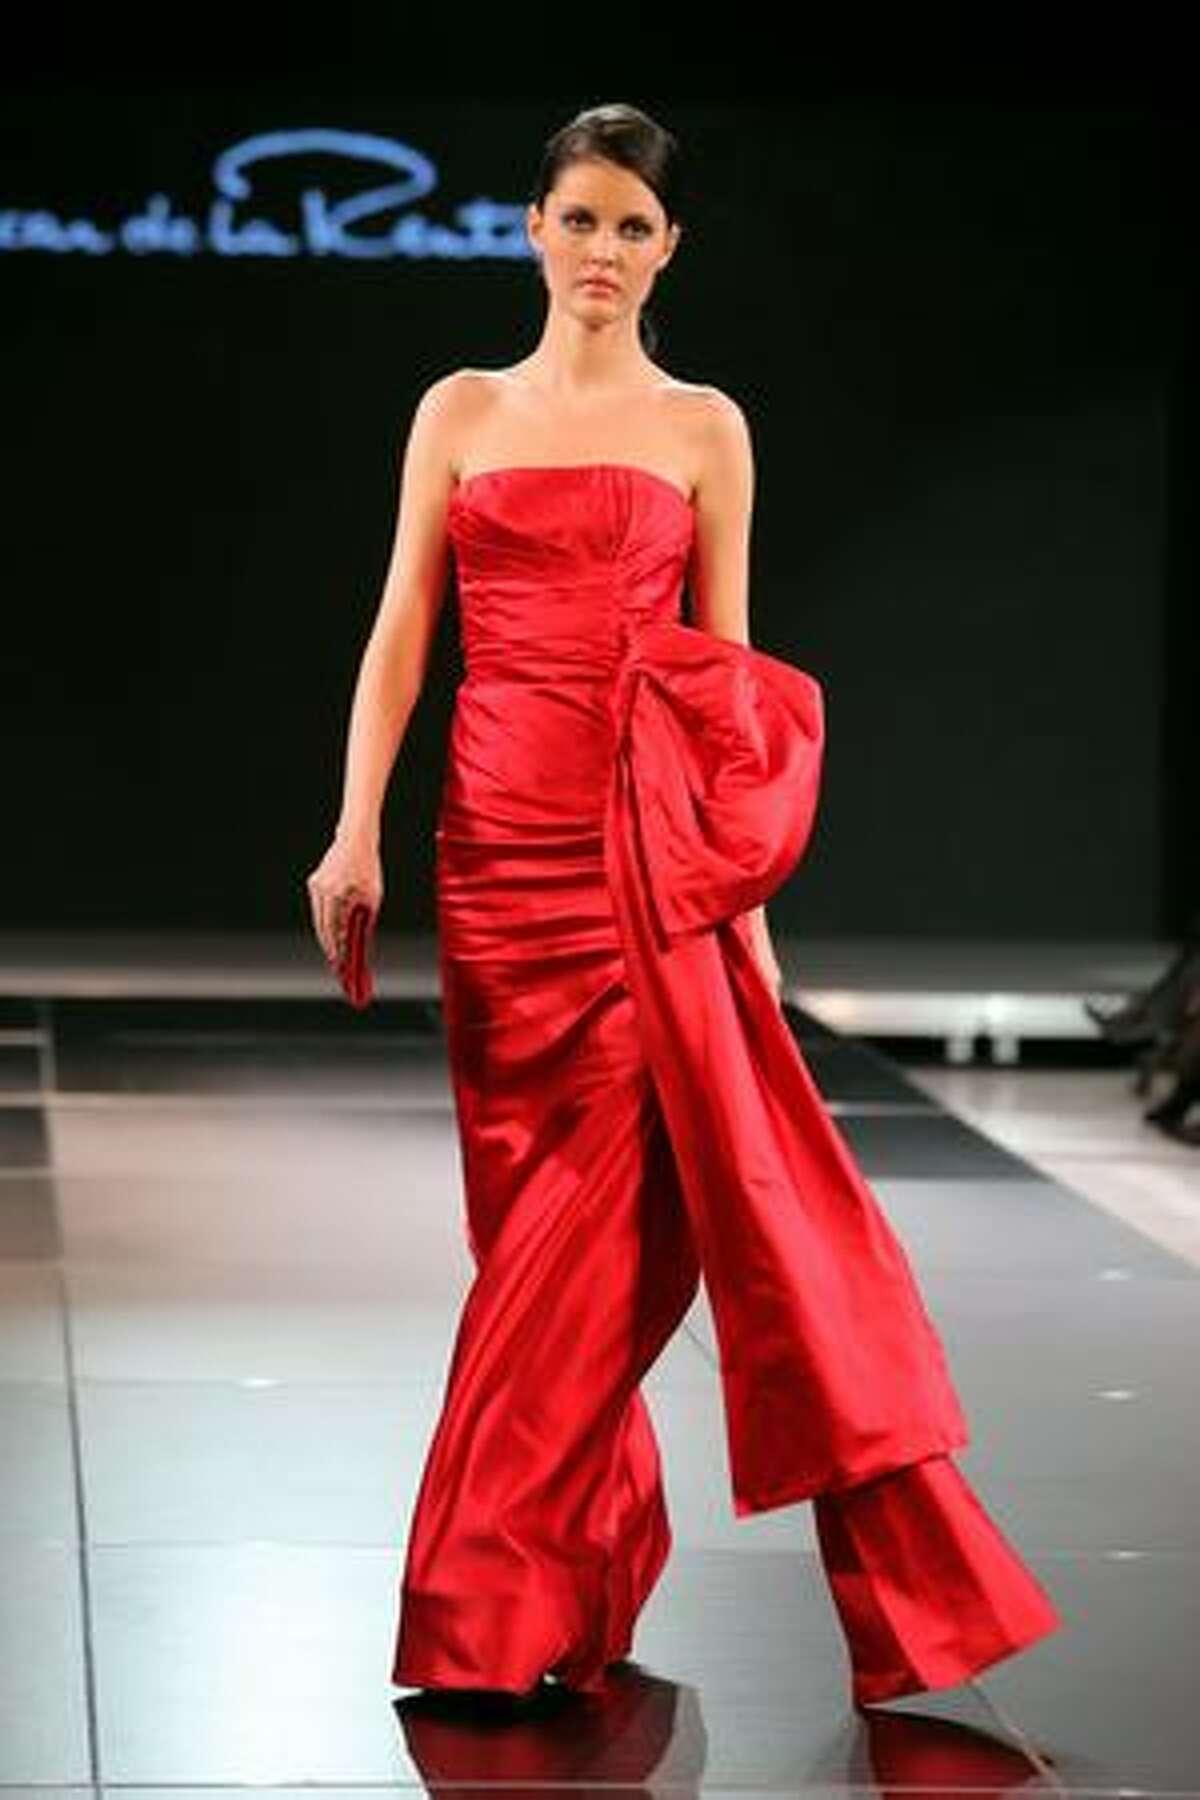 A model walks down the runway during the Oscar De La Renta Fashion Show in Tashkent, Uzbekistan.